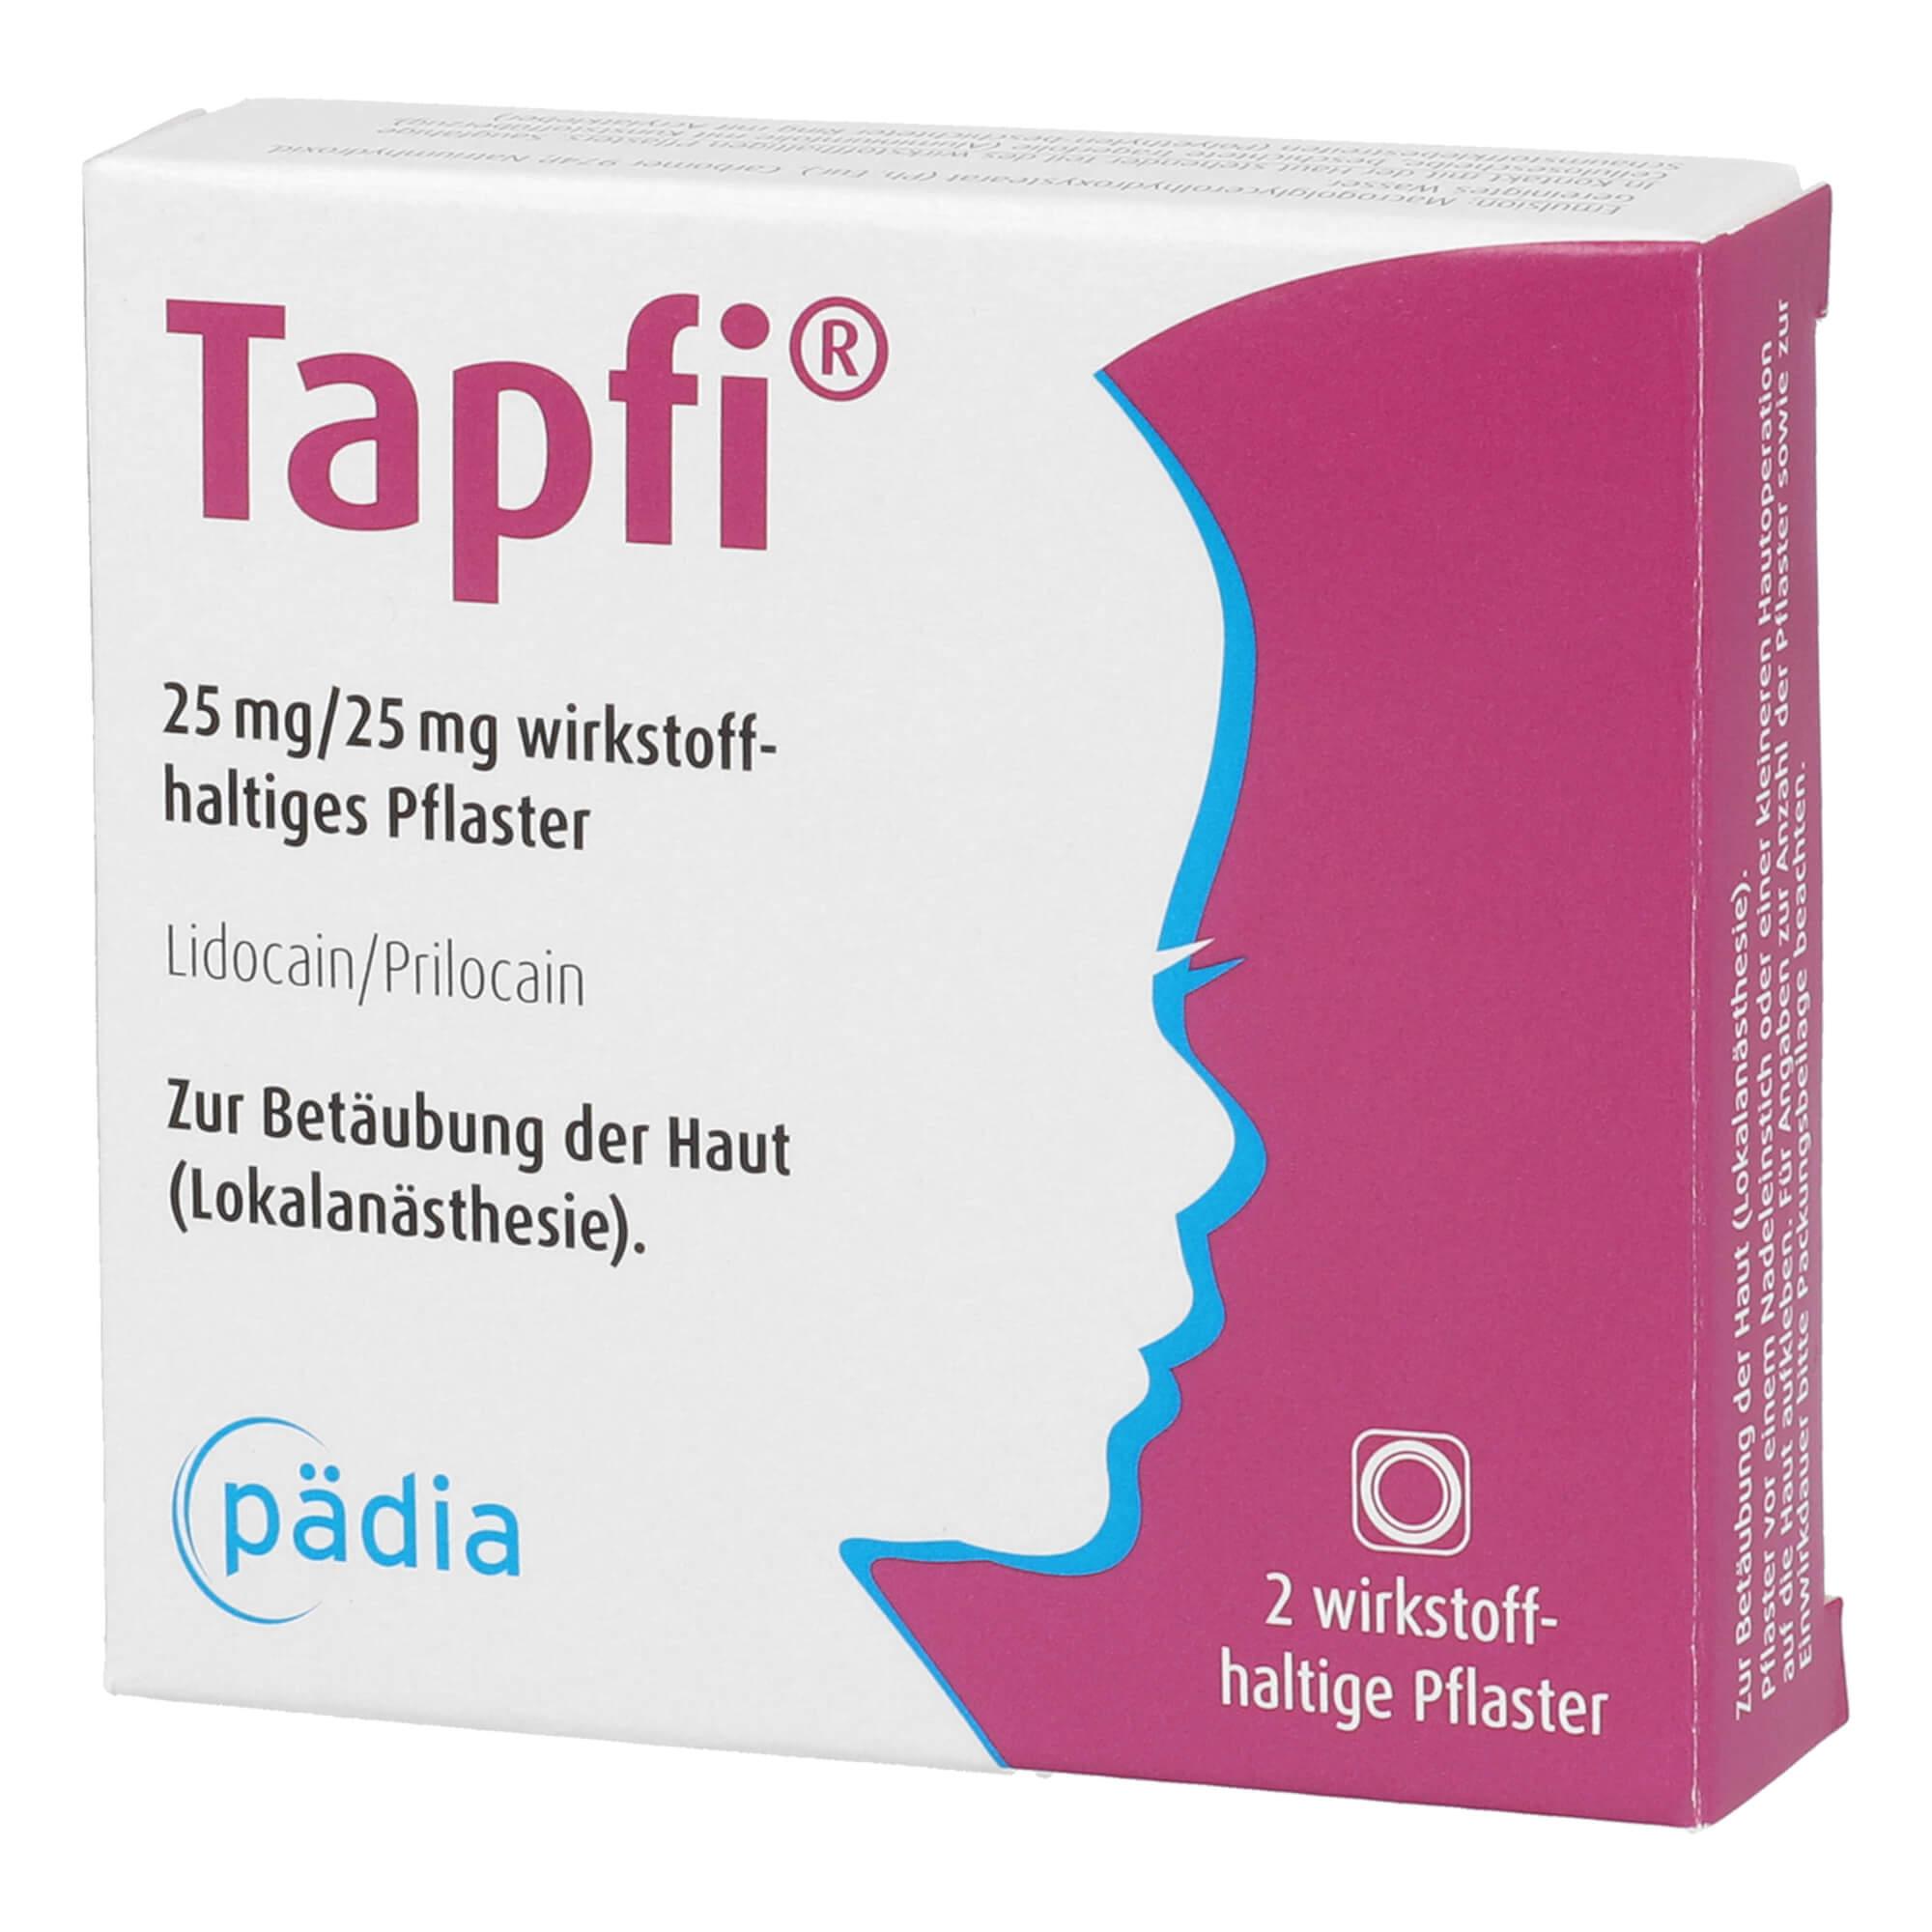 Tapfi 25 mg/25 mg Wirkstoffhaltiges Pflaster